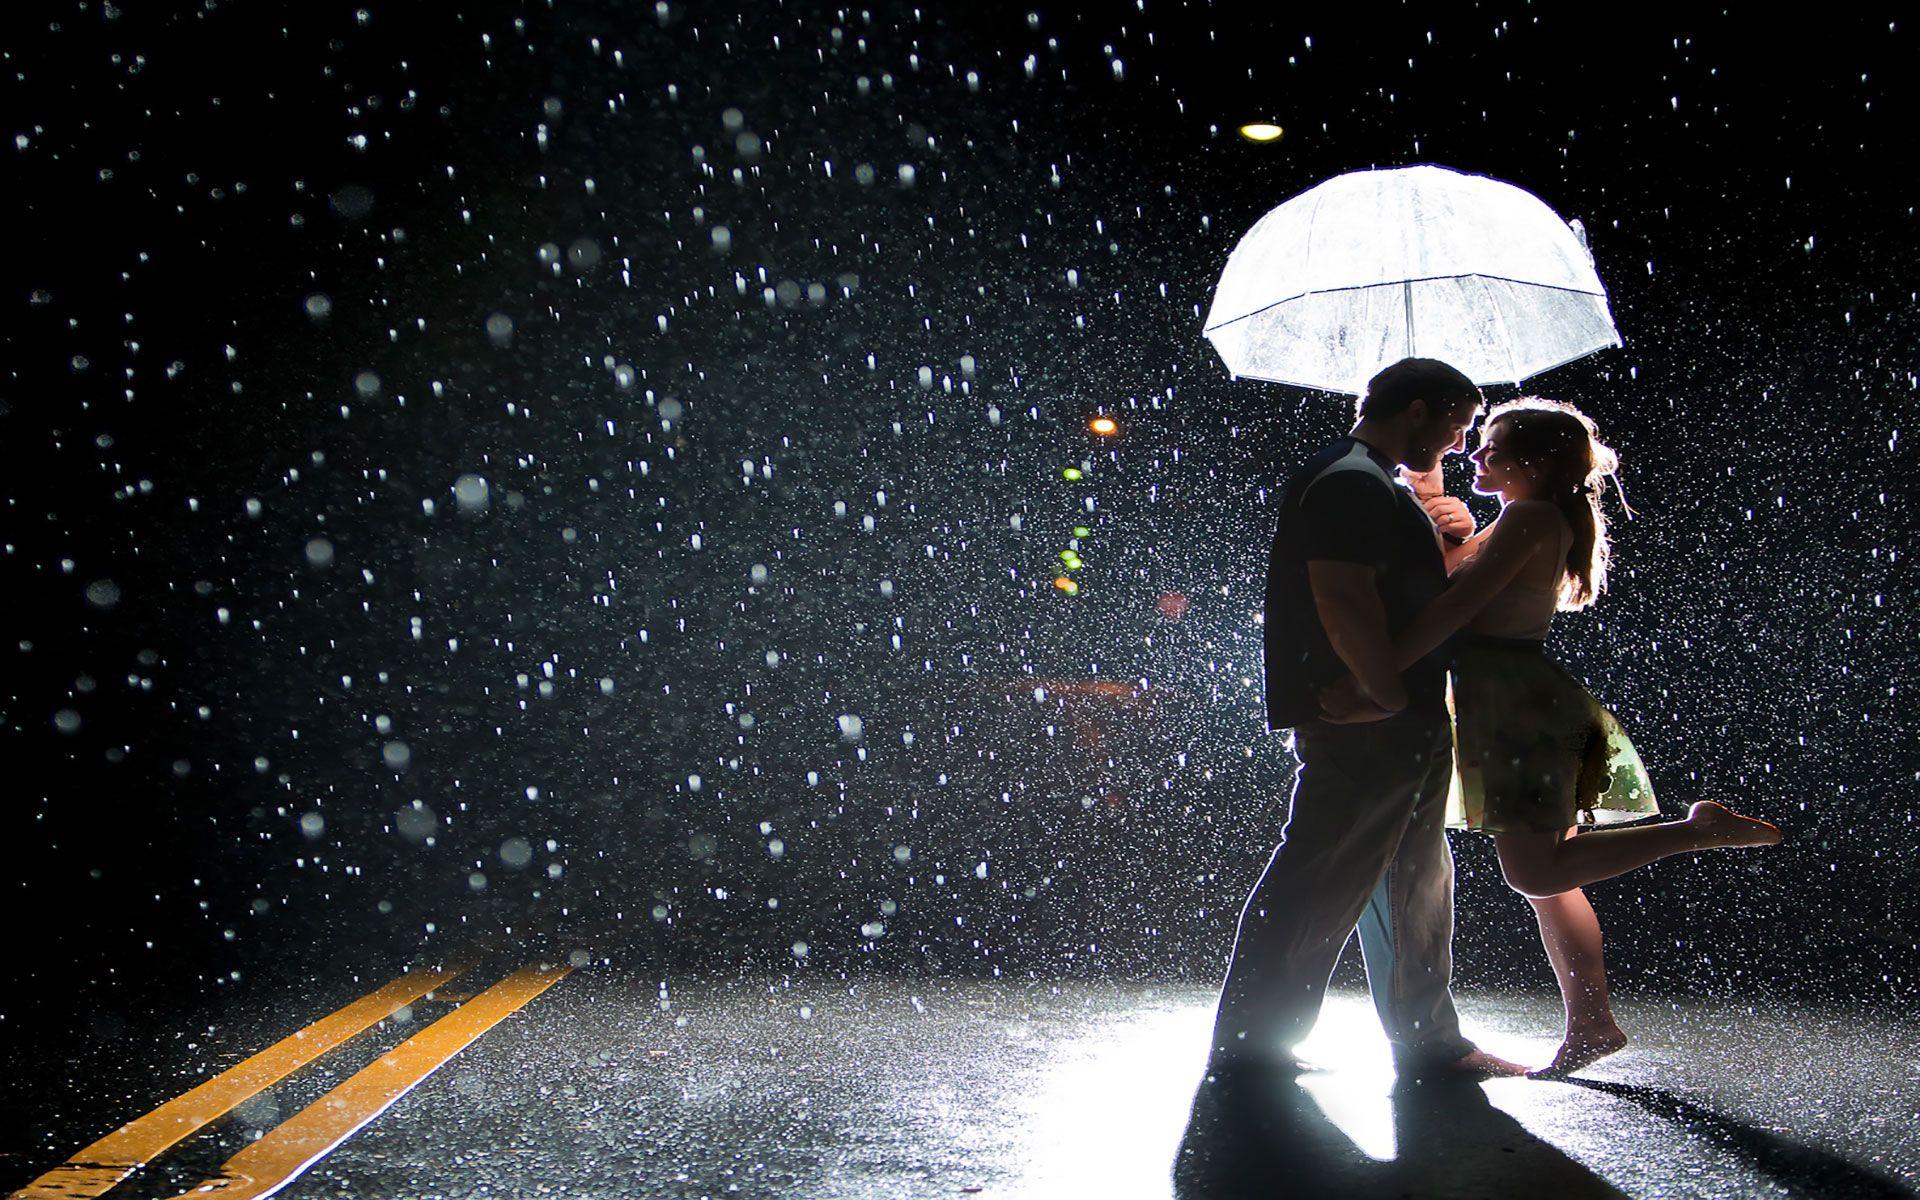 romantic rainy wallpaper - photo #5